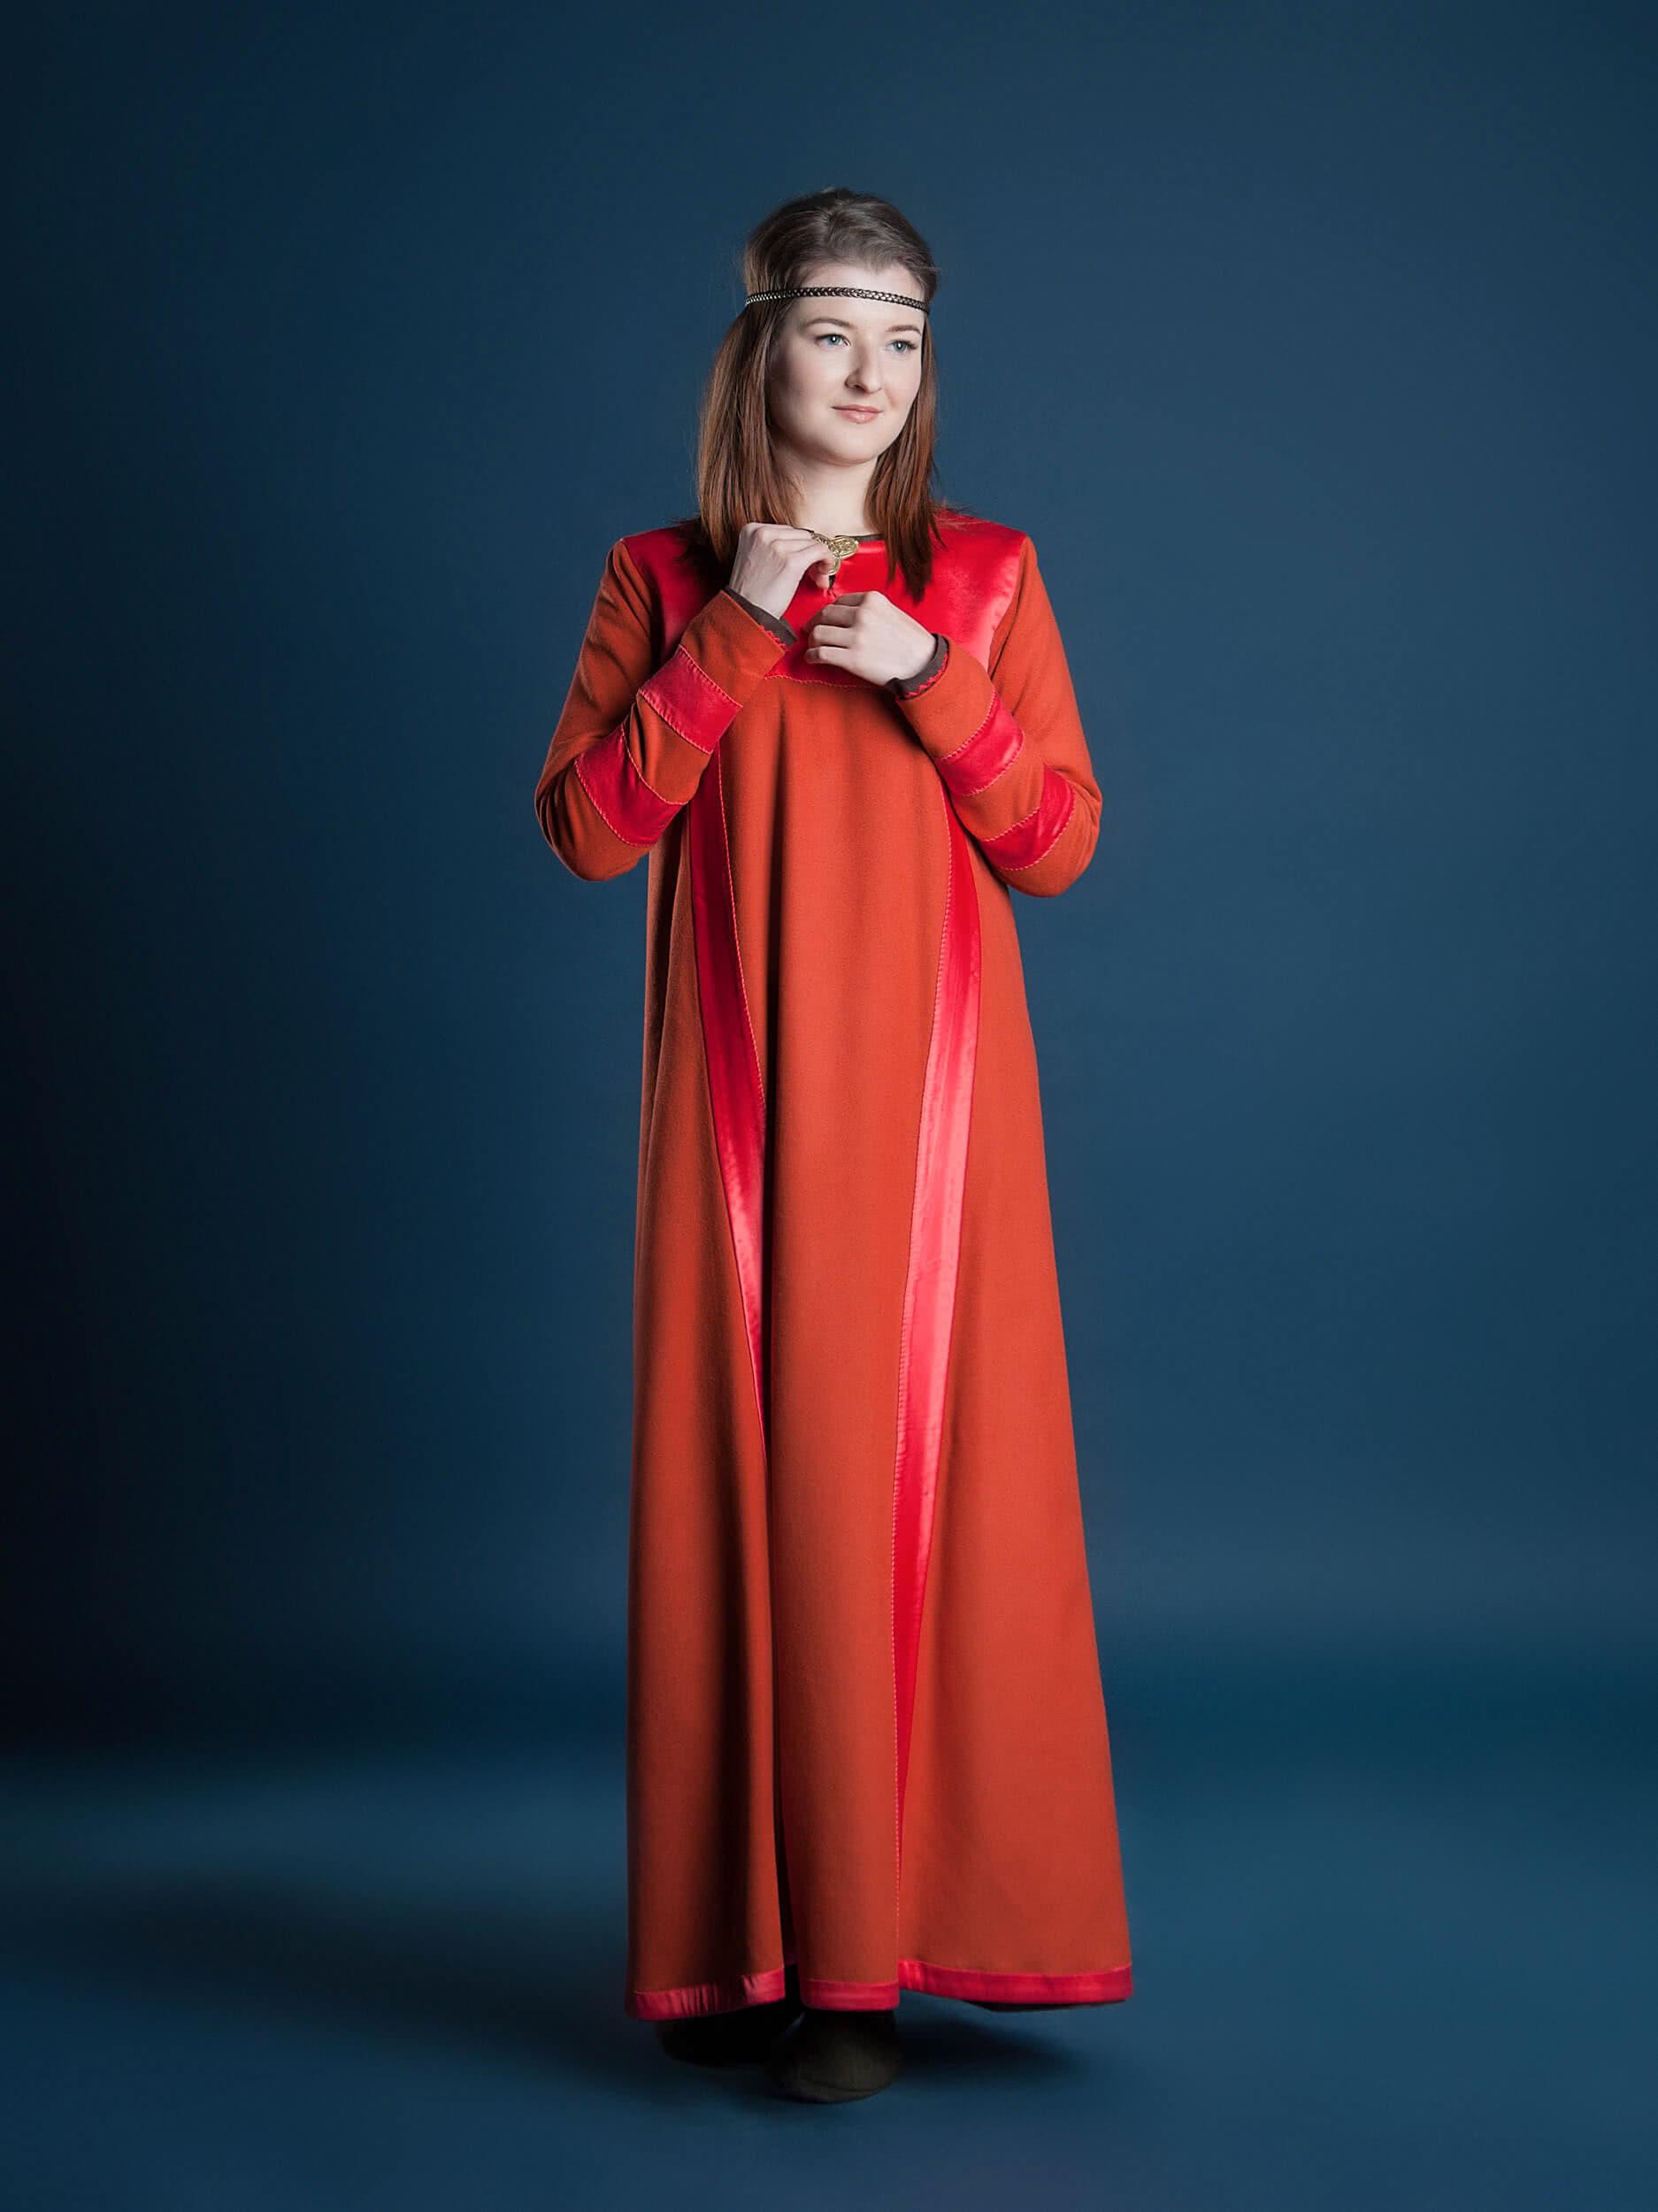 viking lower dress viking clothing